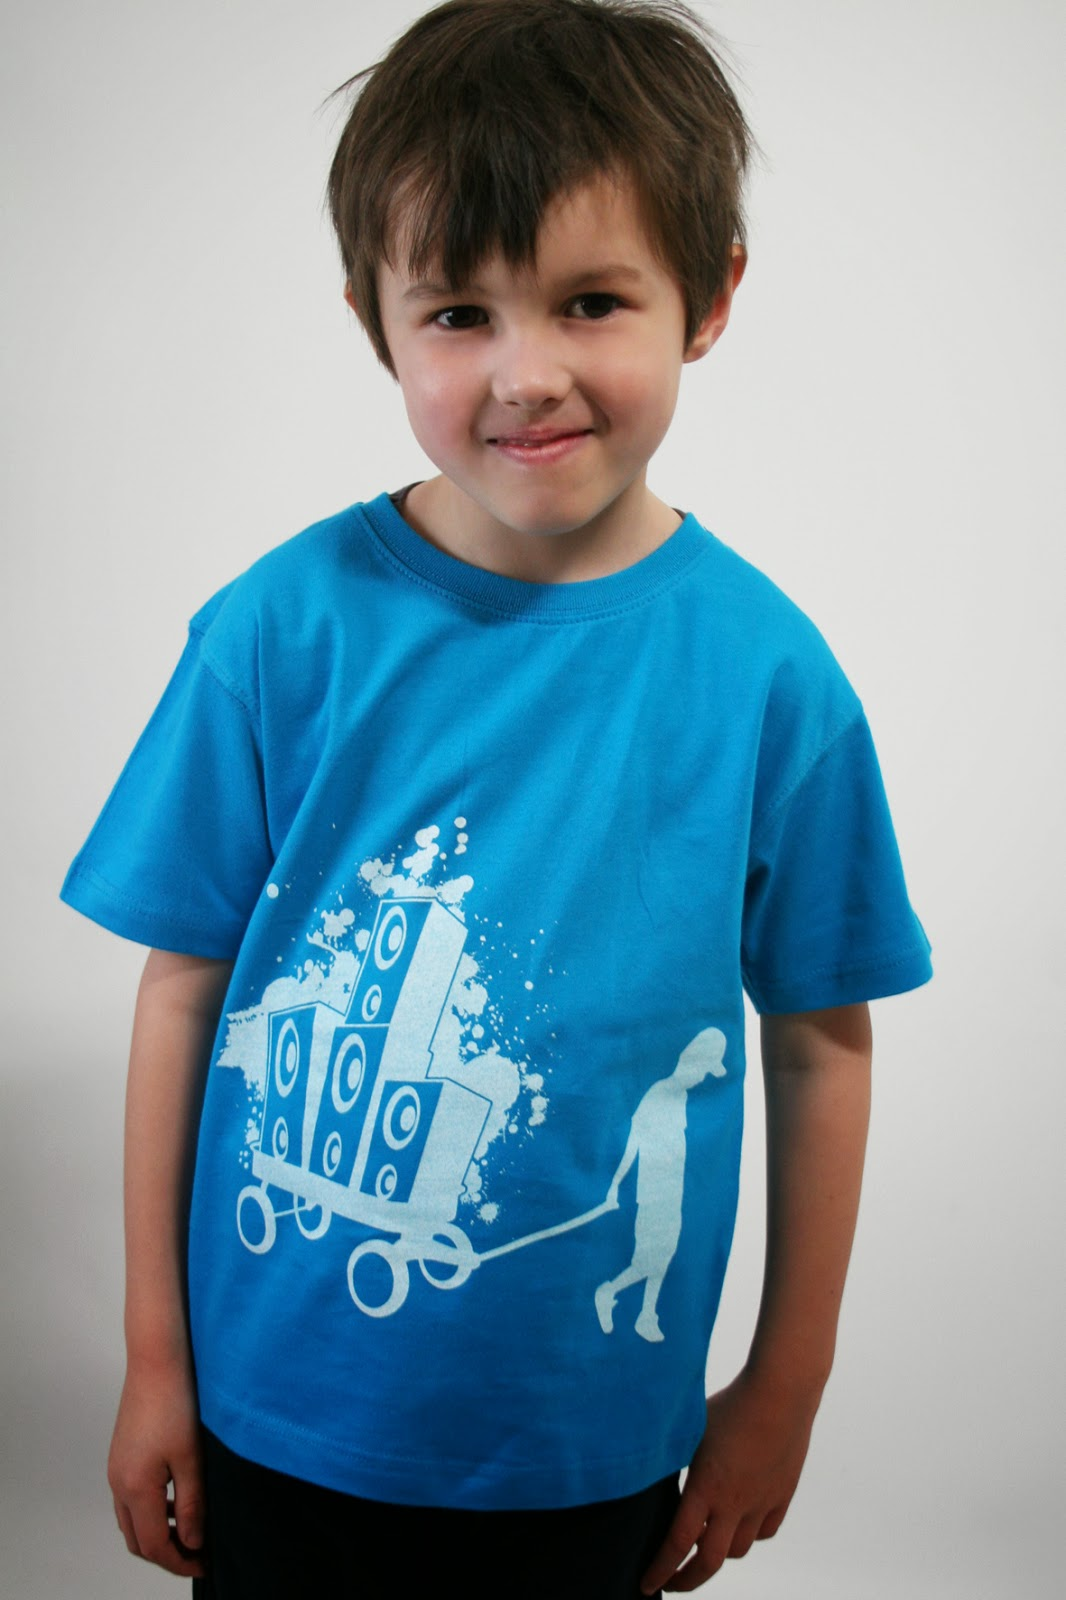 Kindershirt mit Boxenbernd, Musik-Shirt